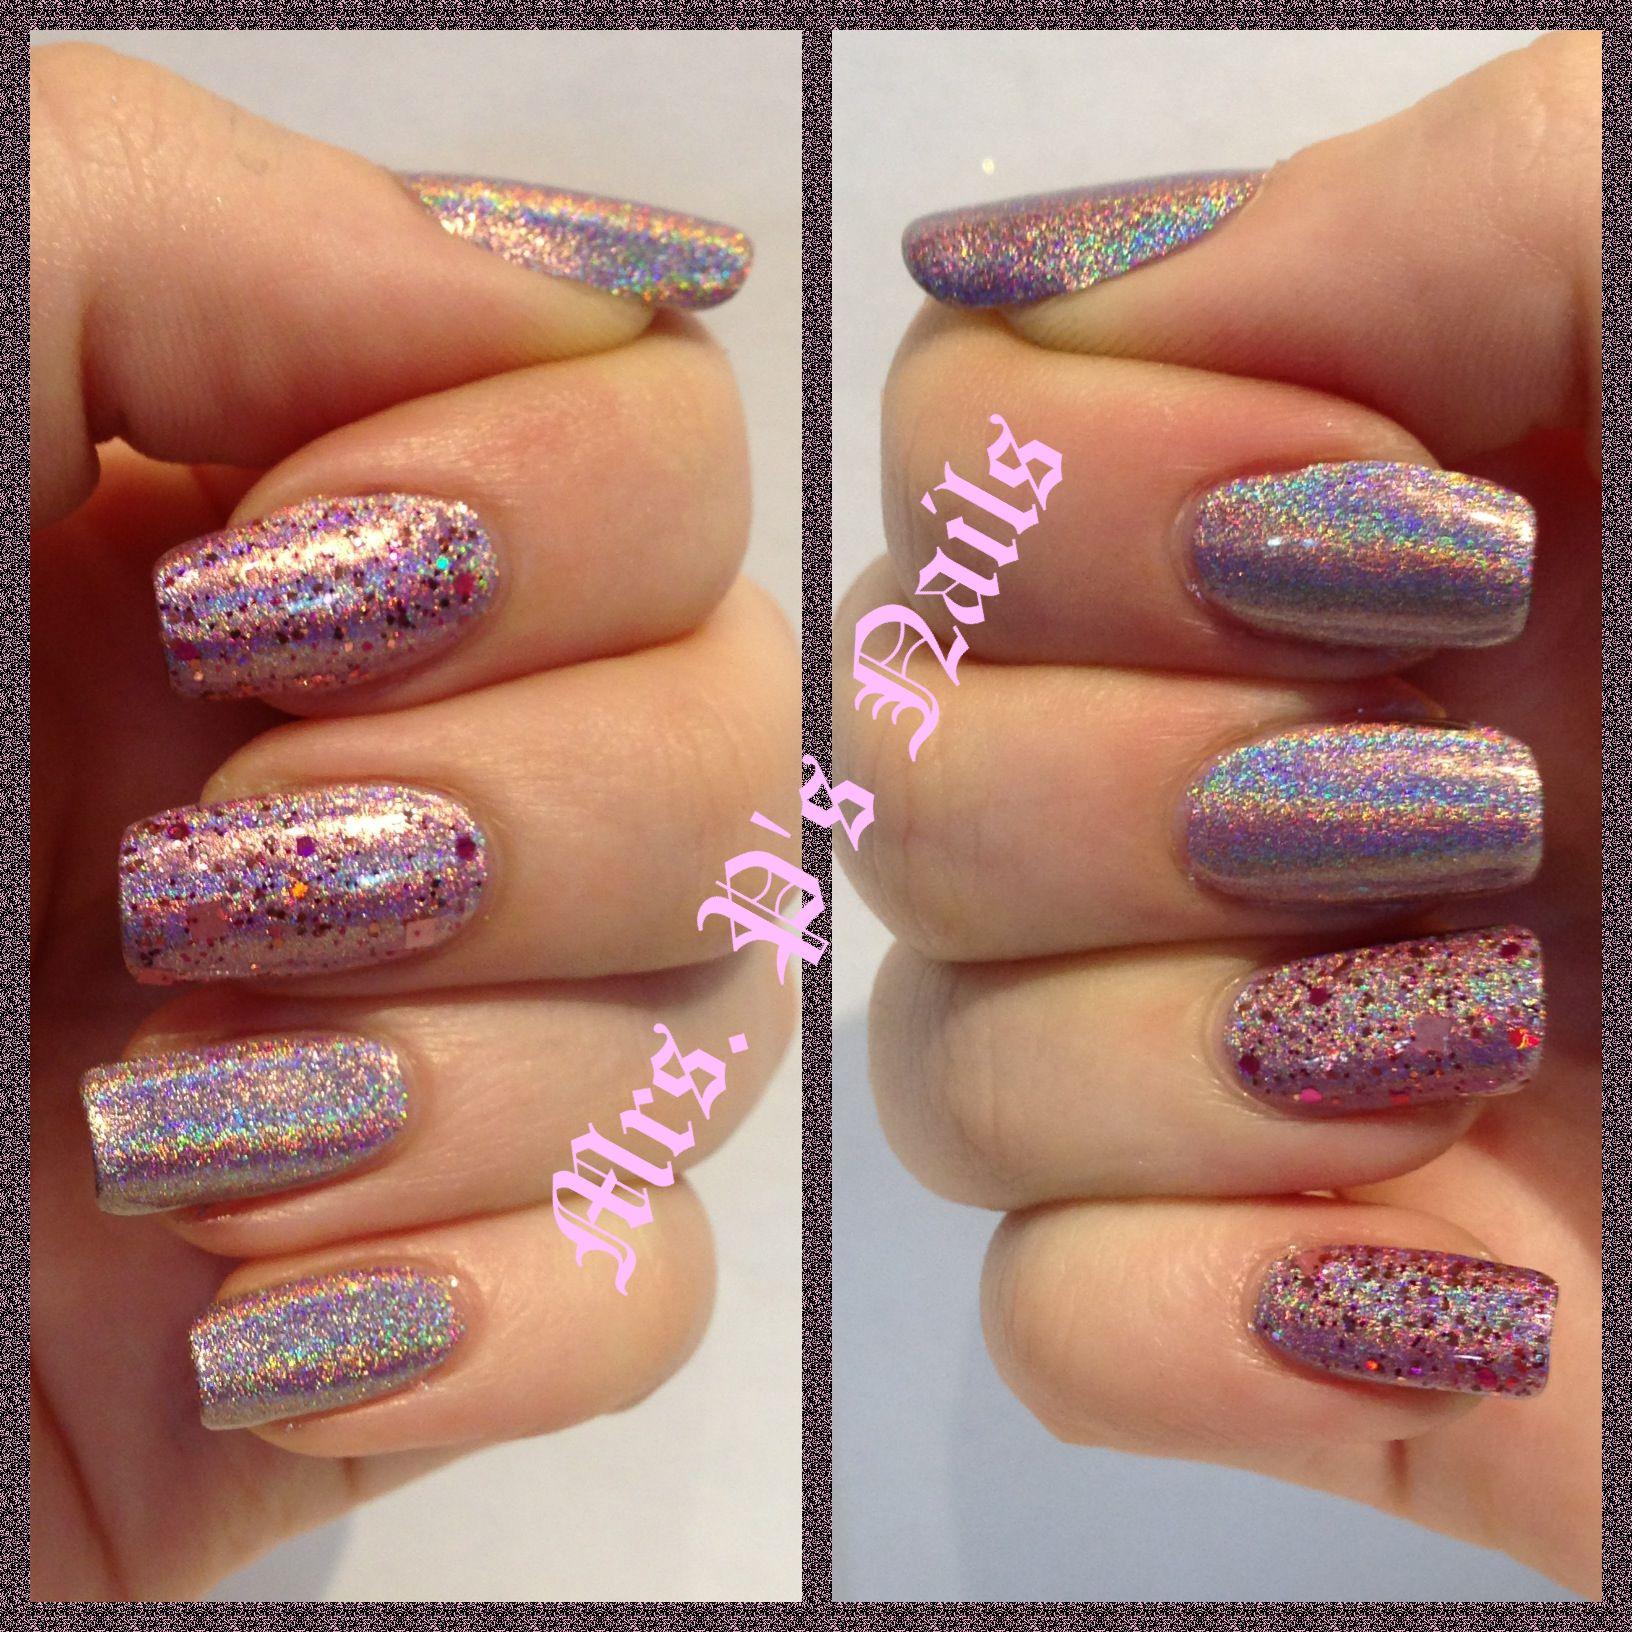 Color club Halo Hues Cloud Nine with Dollish Polish A Peachy Princess on accent nails